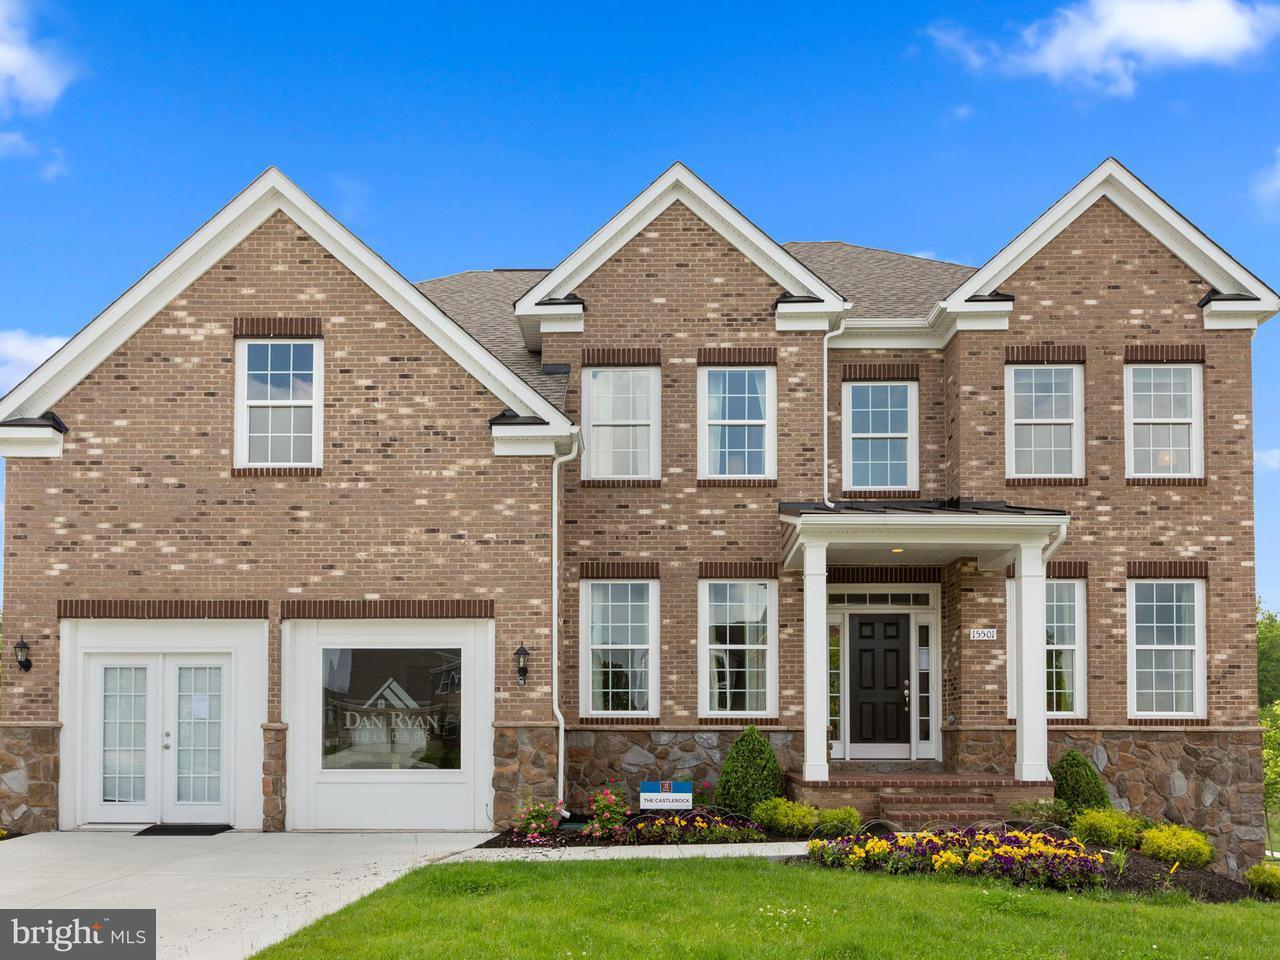 Single Family for Sale at 0 Fitzgerald St #castlerock 2 Plan Gerrardstown, West Virginia 25420 United States